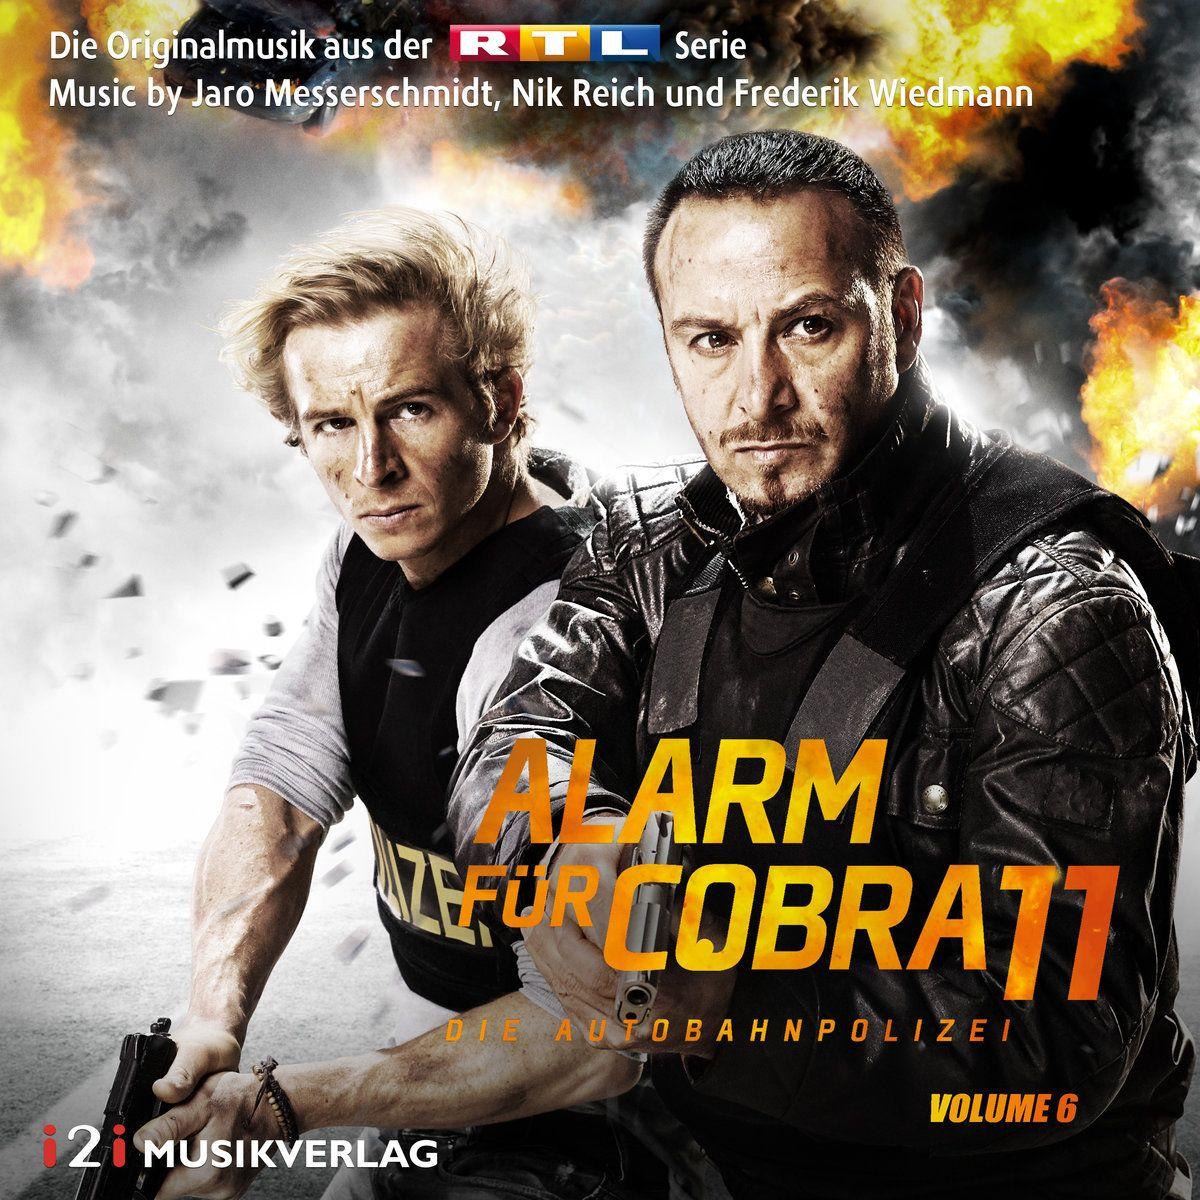 cobra 11 Alarm für Cobra 11, Vol. 6 Die Originalmusik